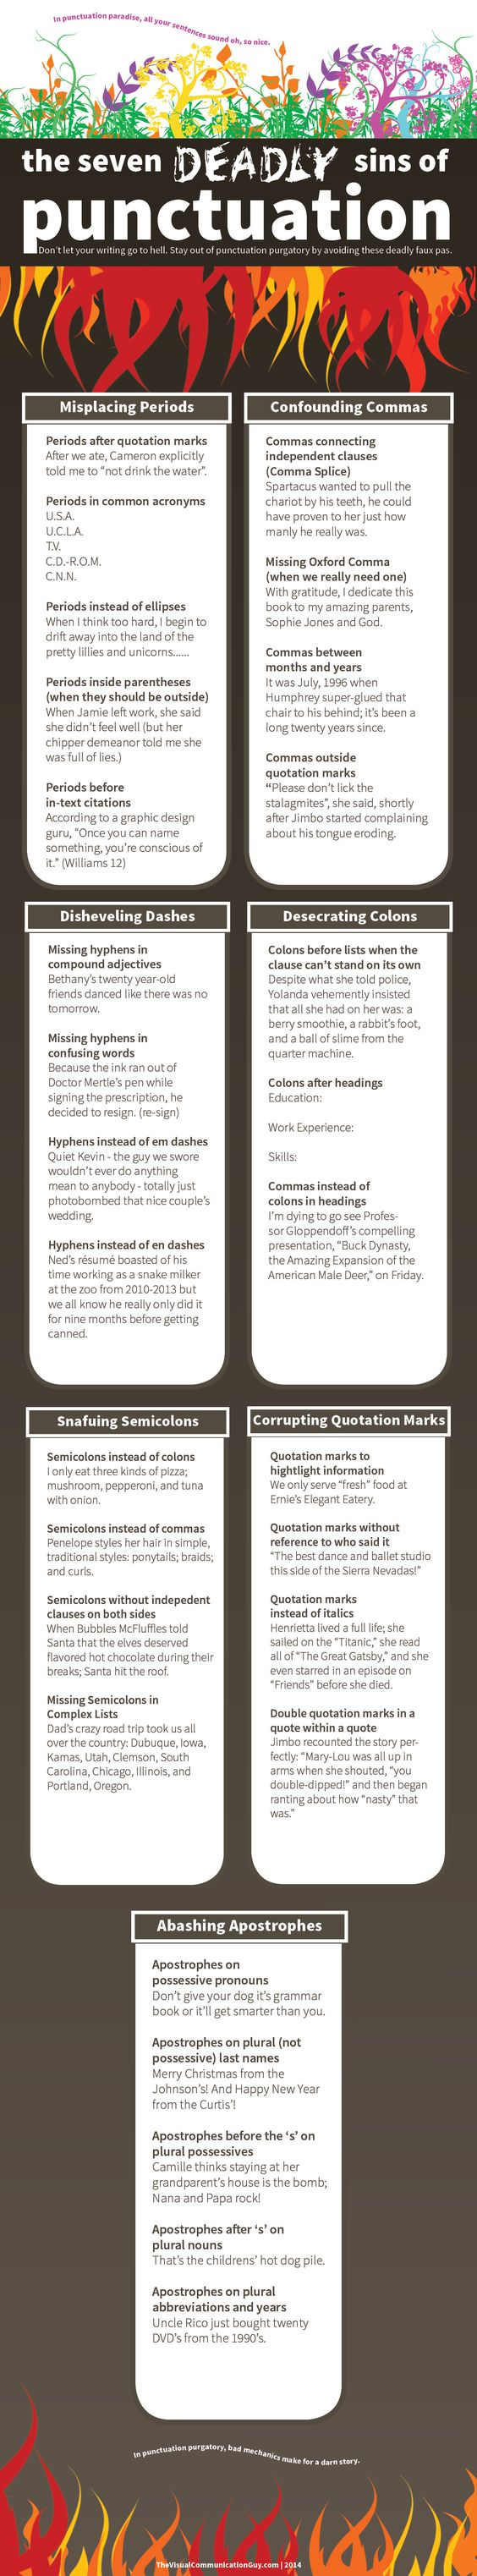 Reflective essay help??correct/edit grammar etc...?